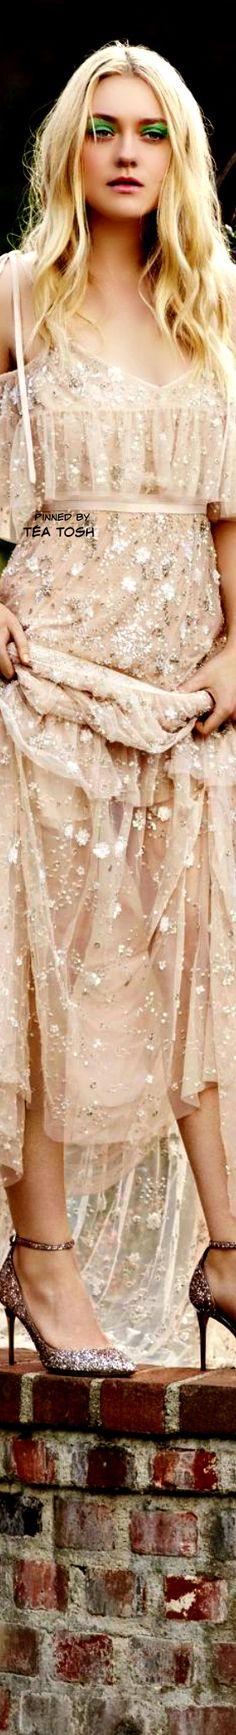 ❇Téa Tosh❇ Dakota Fanning – for Jimmy Choo Spring/Summer 2017 Couture Fashion, Boho Fashion, Fanning Sisters, Dakota And Elle Fanning, Beyond Beauty, Beauty Shots, Celebs, Celebrities, Tiffany Blue